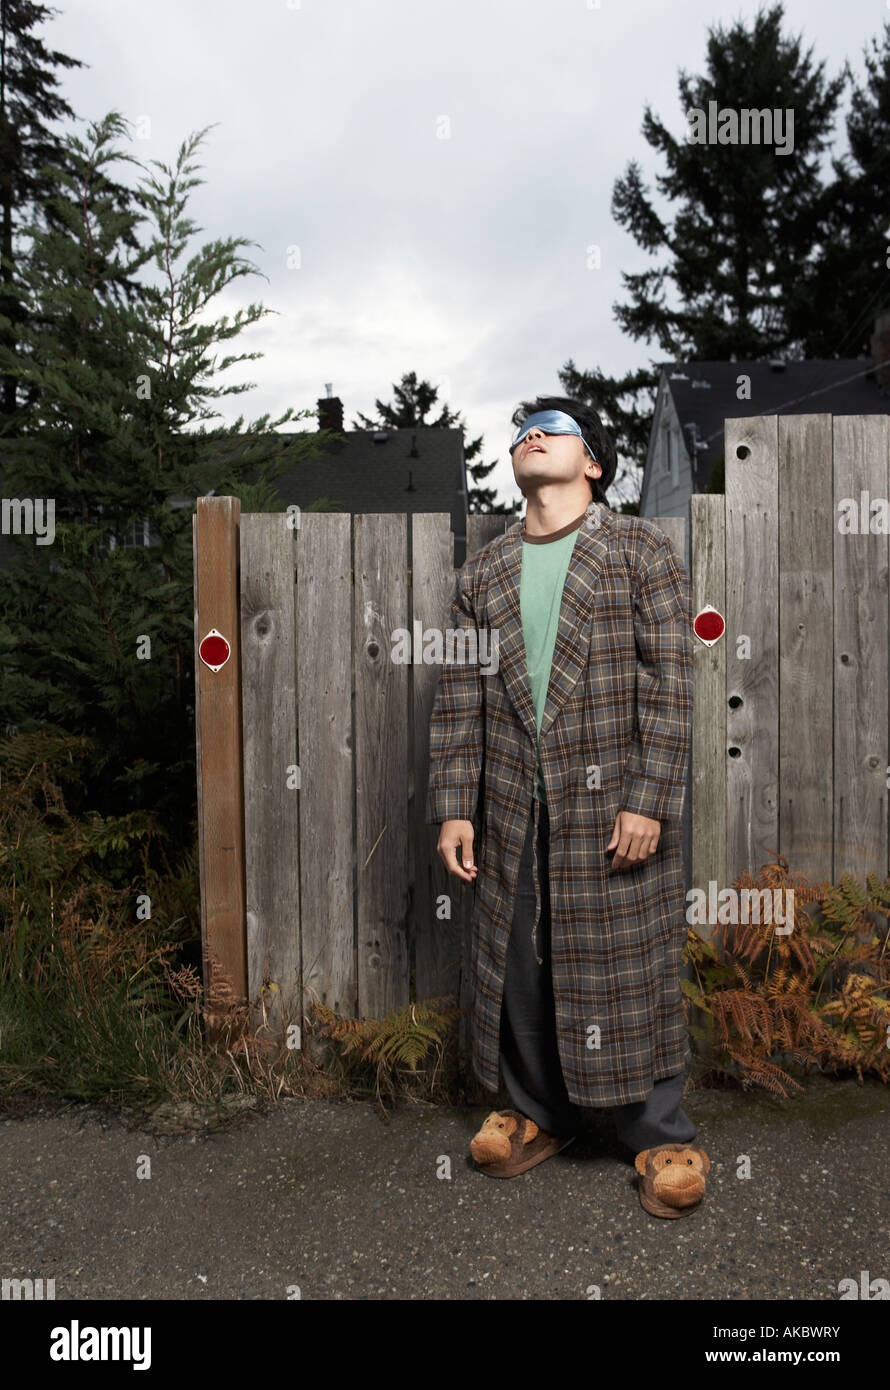 Sleepwalking man snoozing next to fence - Stock Image